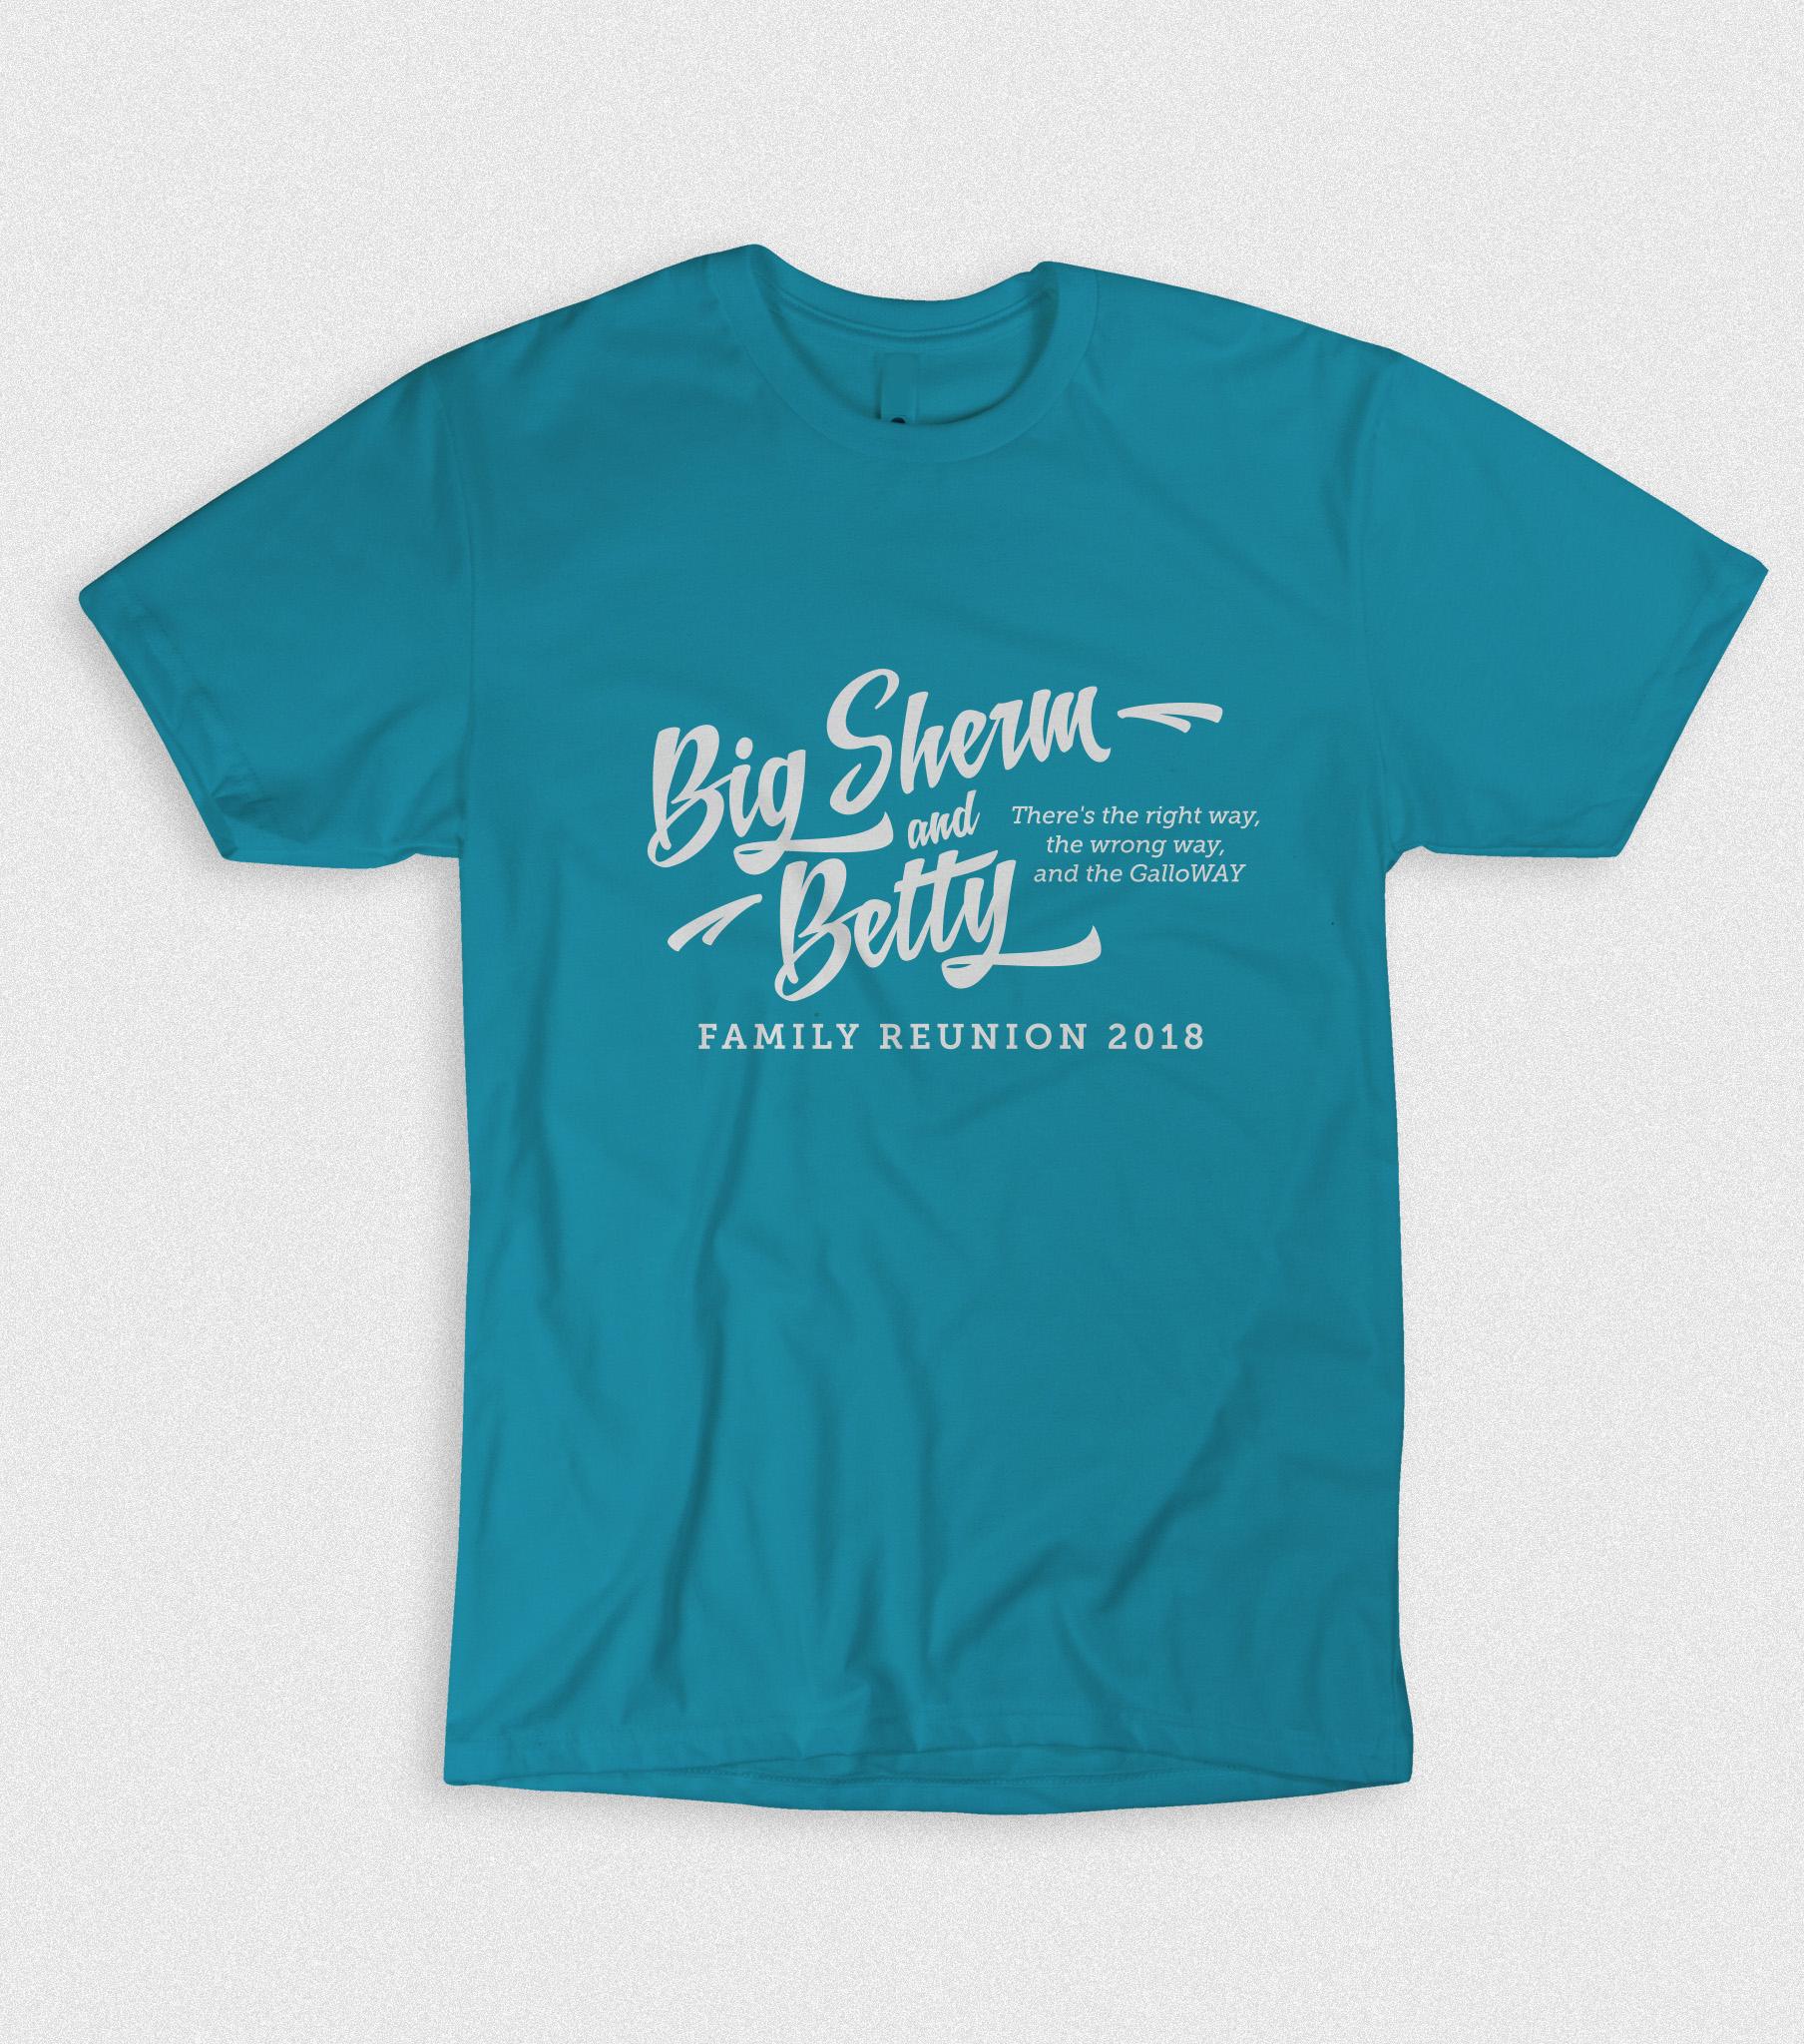 bigsherm-teeshirt.jpg